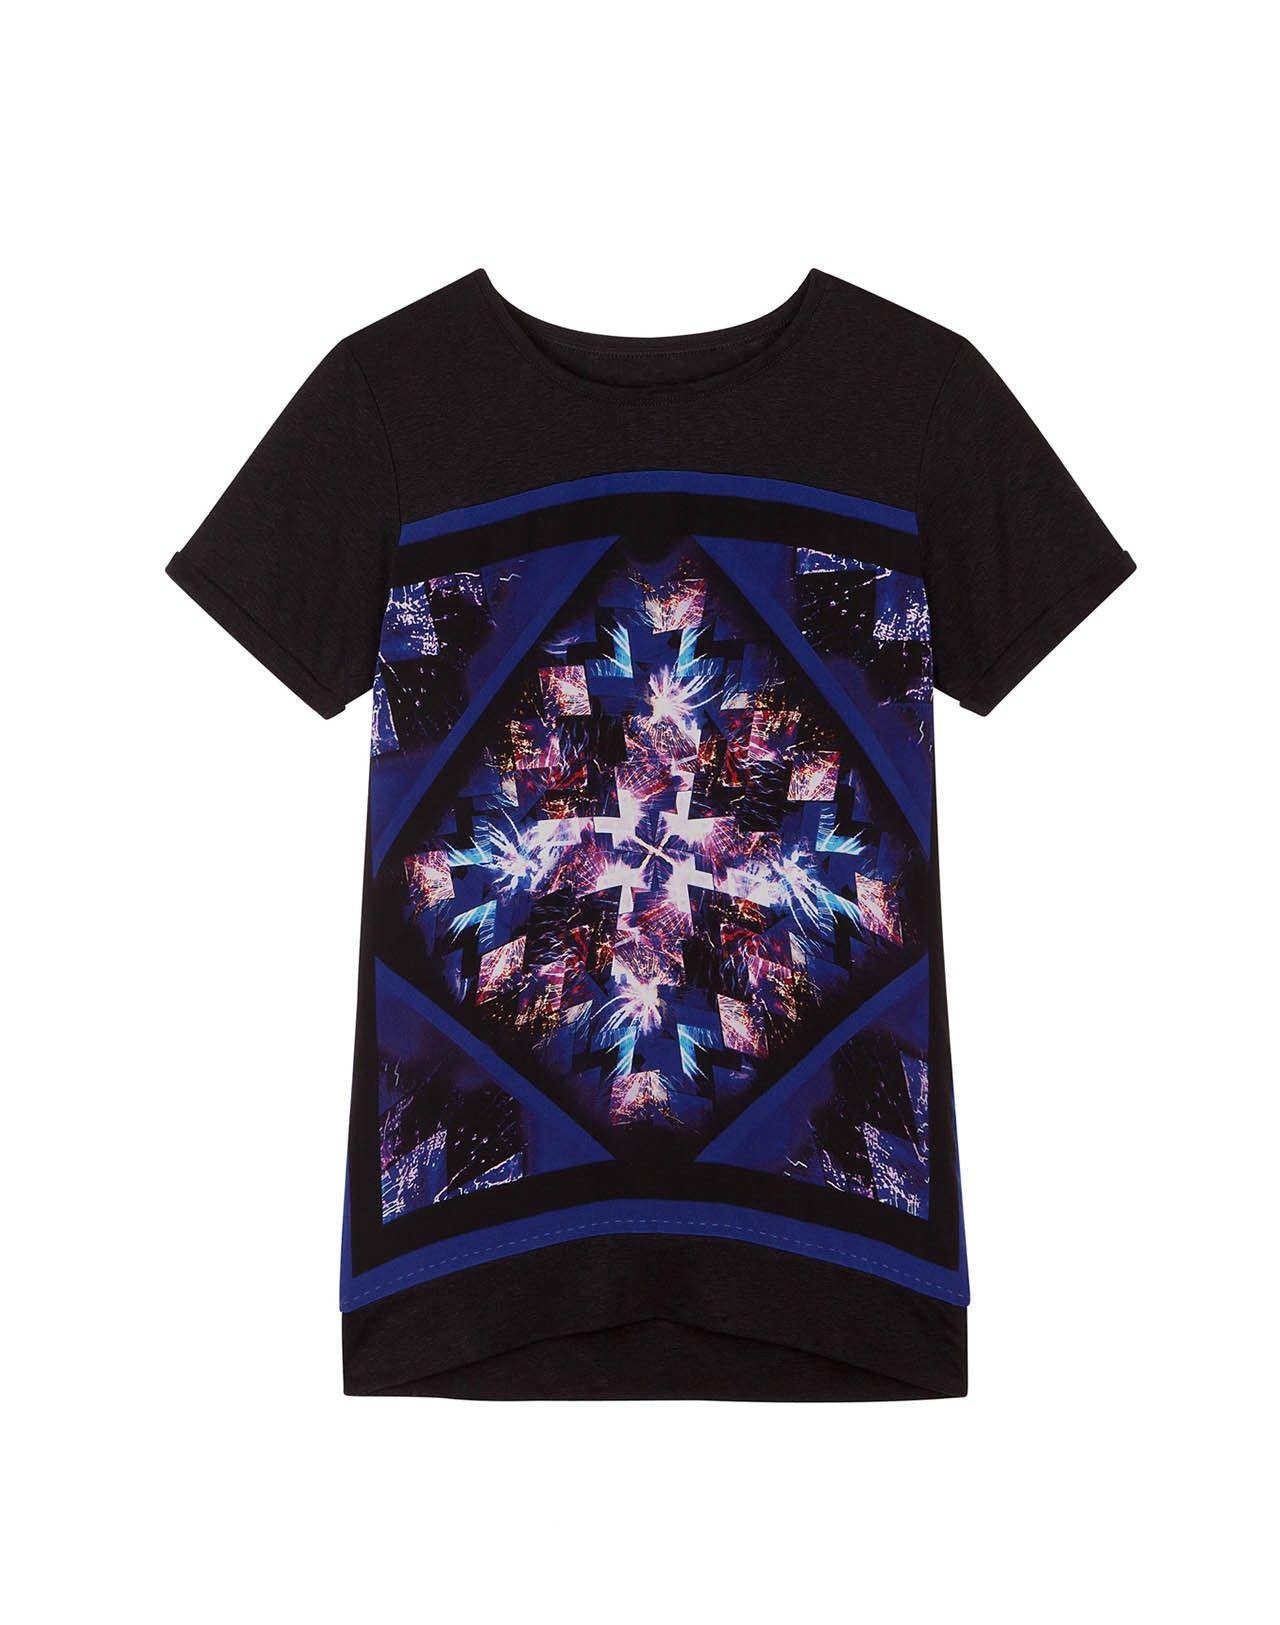 Geometric fireworks printed t-shirt // TINTAMARRE